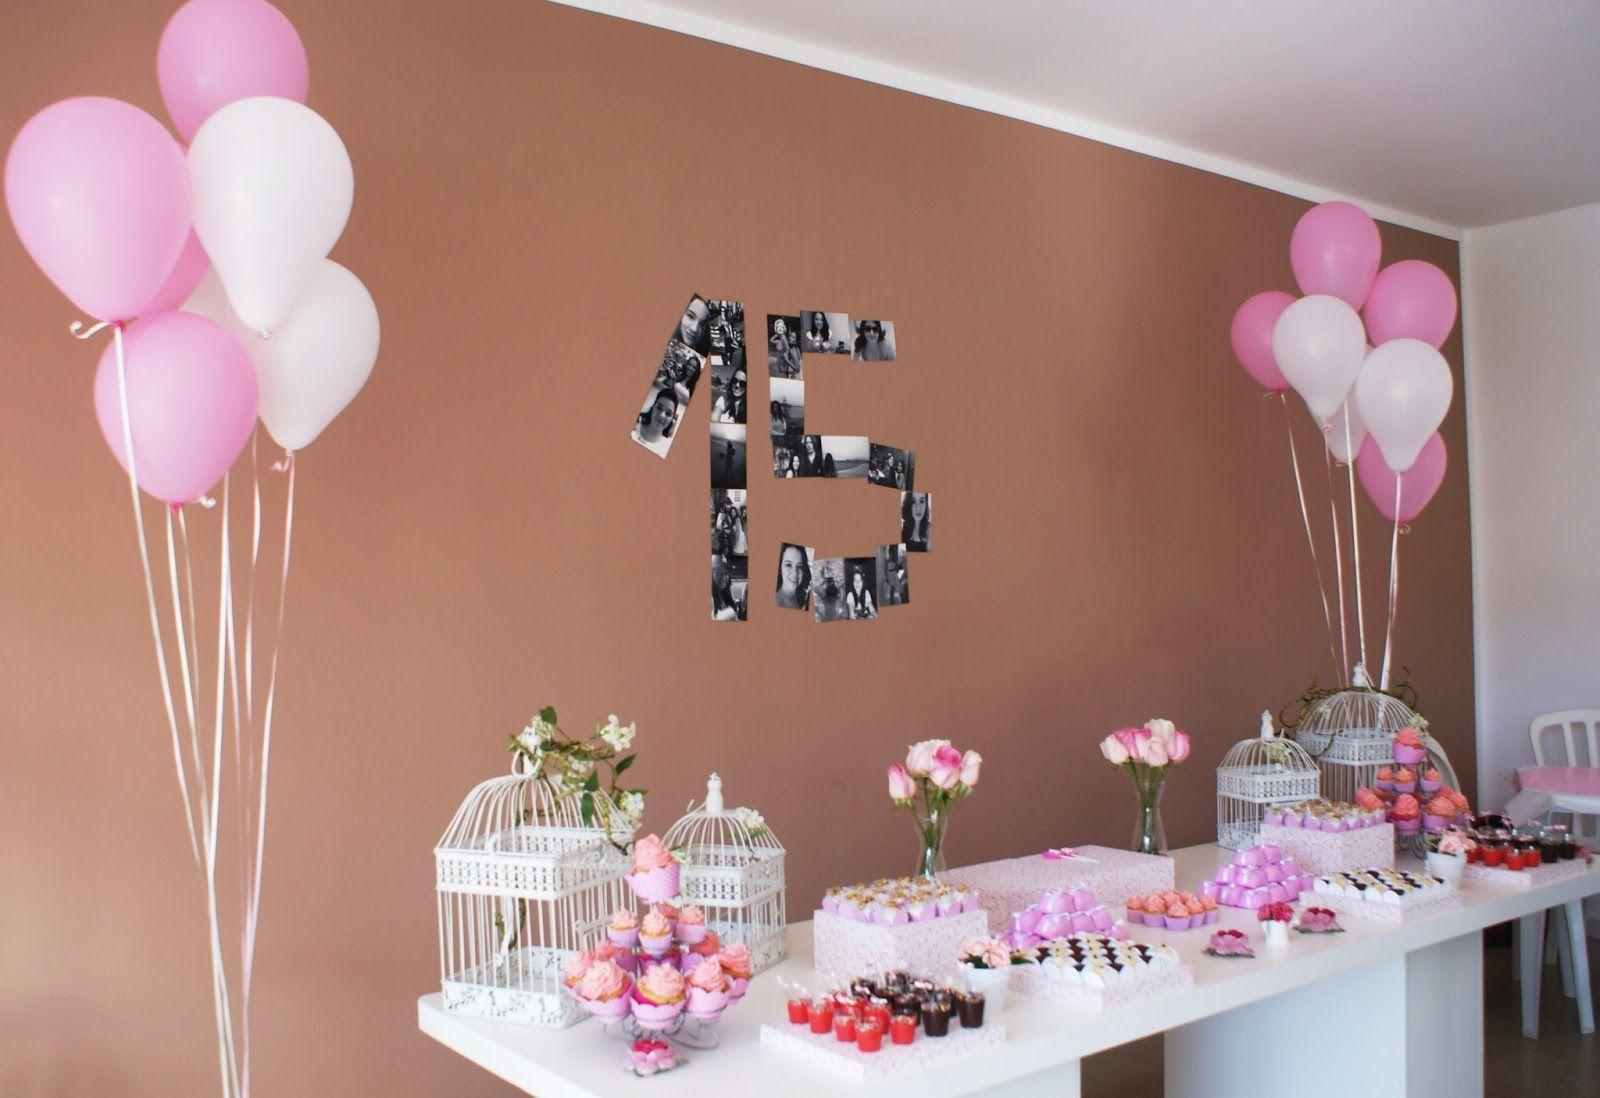 20 modelos para decora o de festa de 15 anos simples for Cubre sillas para 15 anos